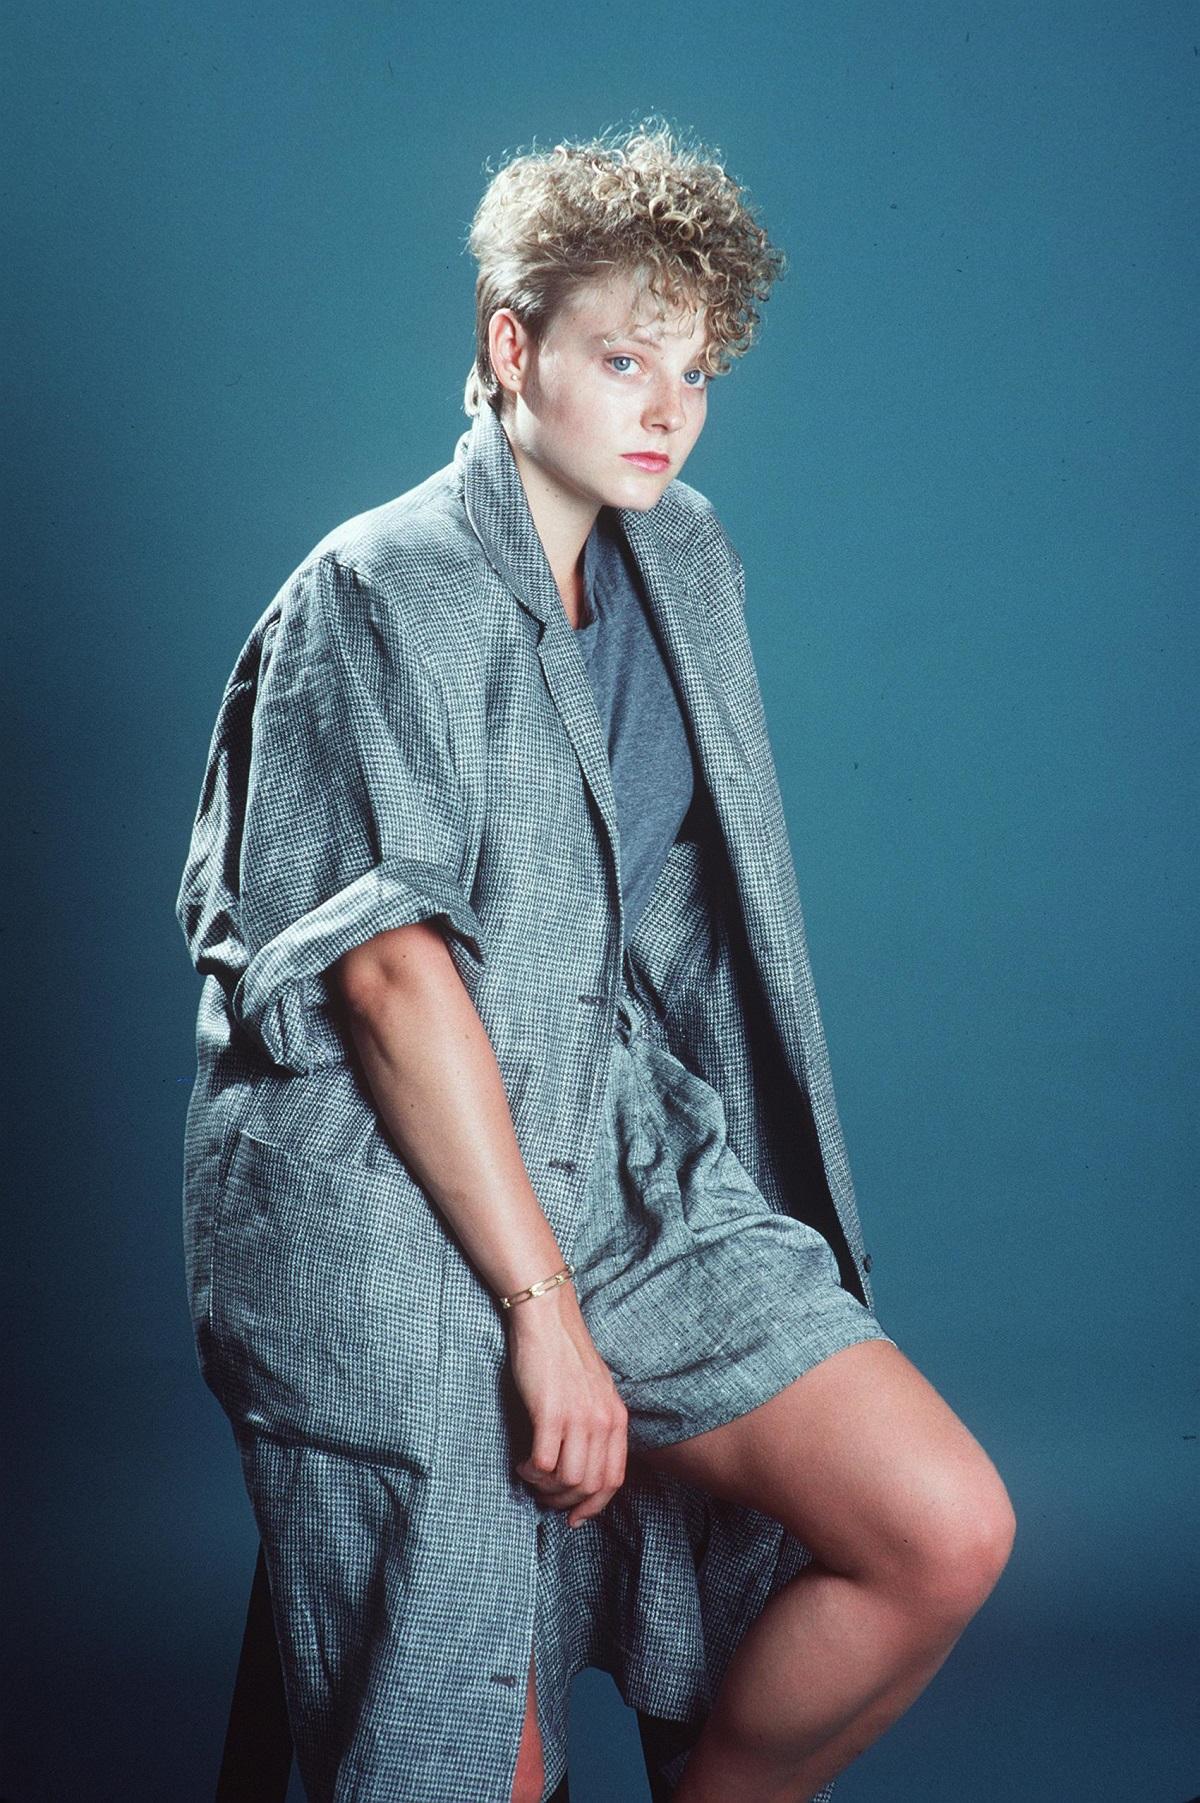 Jodie Foster in 1984